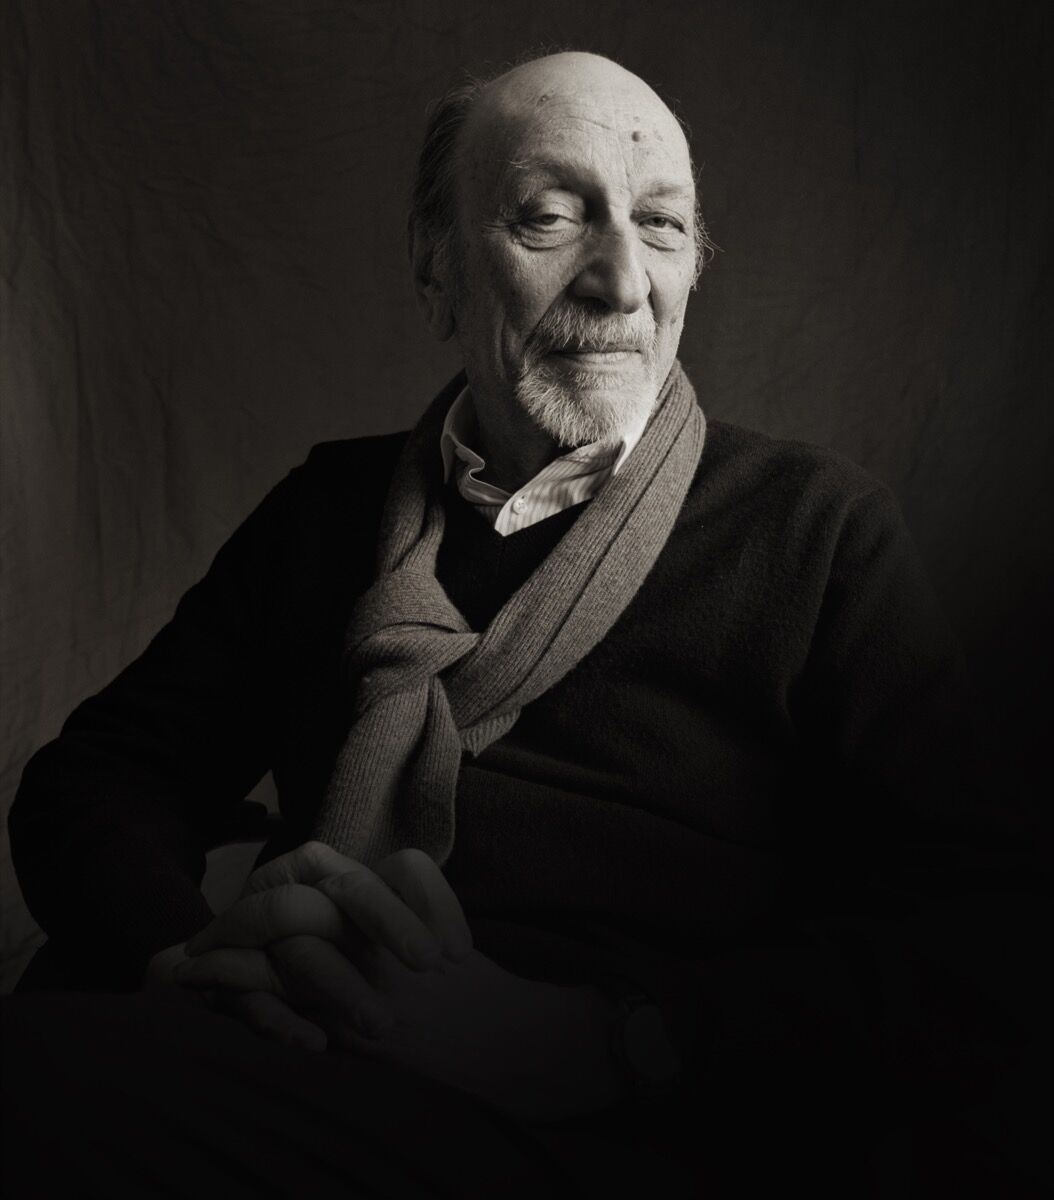 Portrait of Milton Glaser by Michael Somoroff. Courtesy of Milton Glaser, Inc.